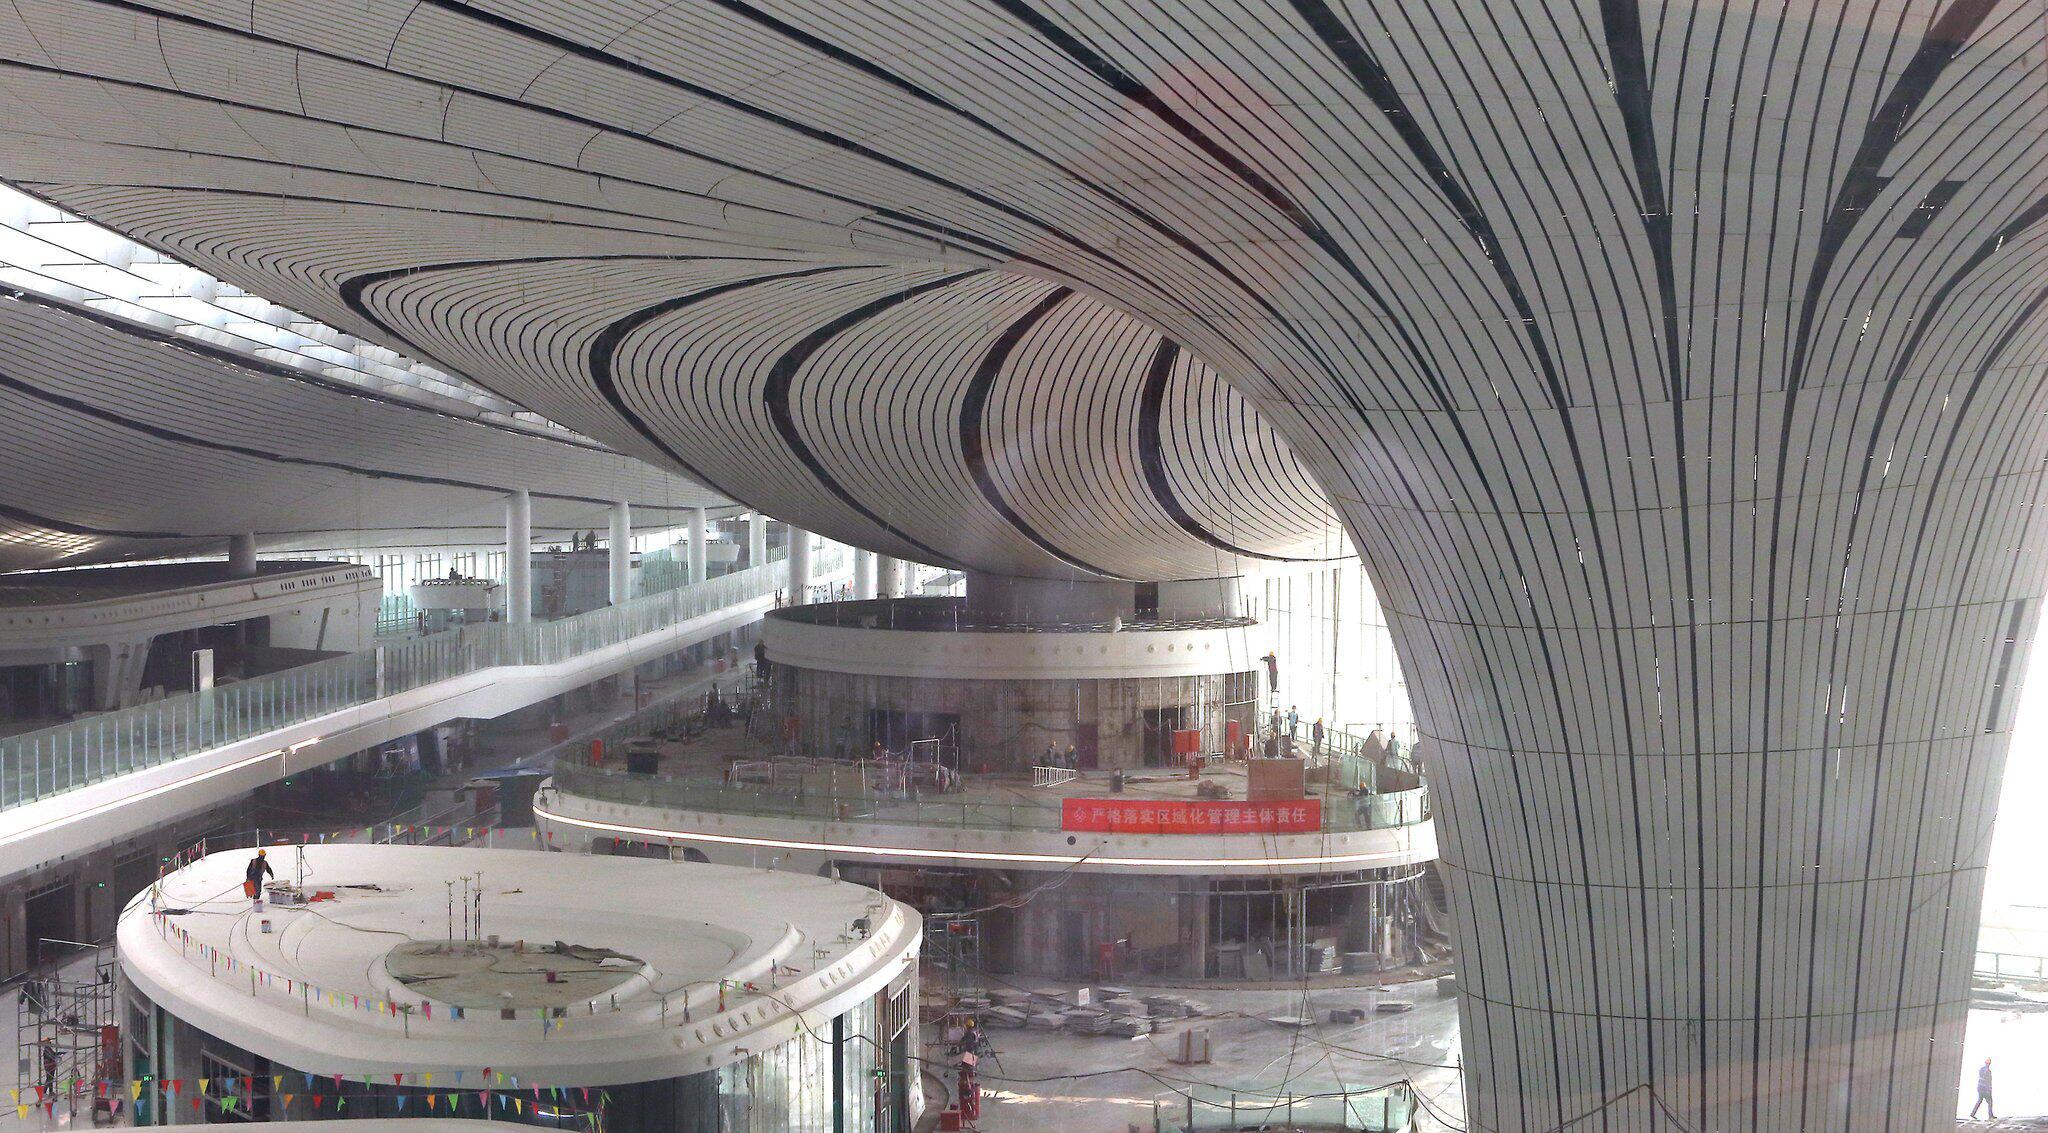 Bild zu Flughafen Peking-Daxing